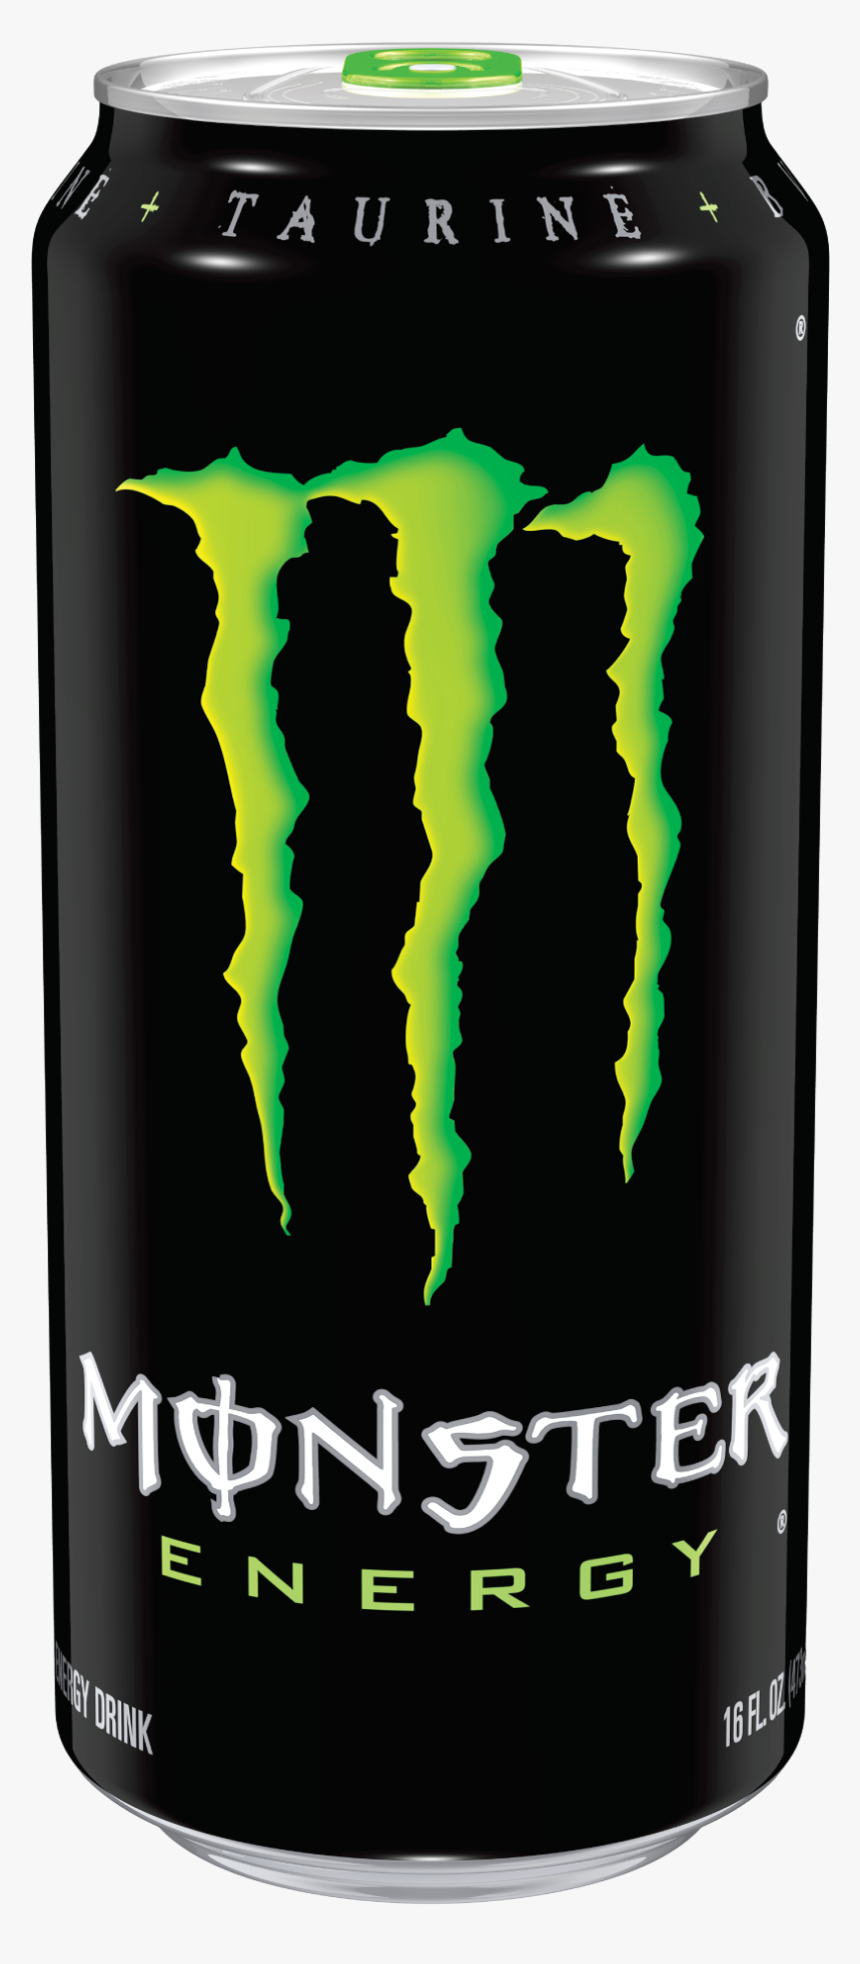 Clip Art Monster Energy Drink Png - Monster Energy, Transparent Png, Free Download